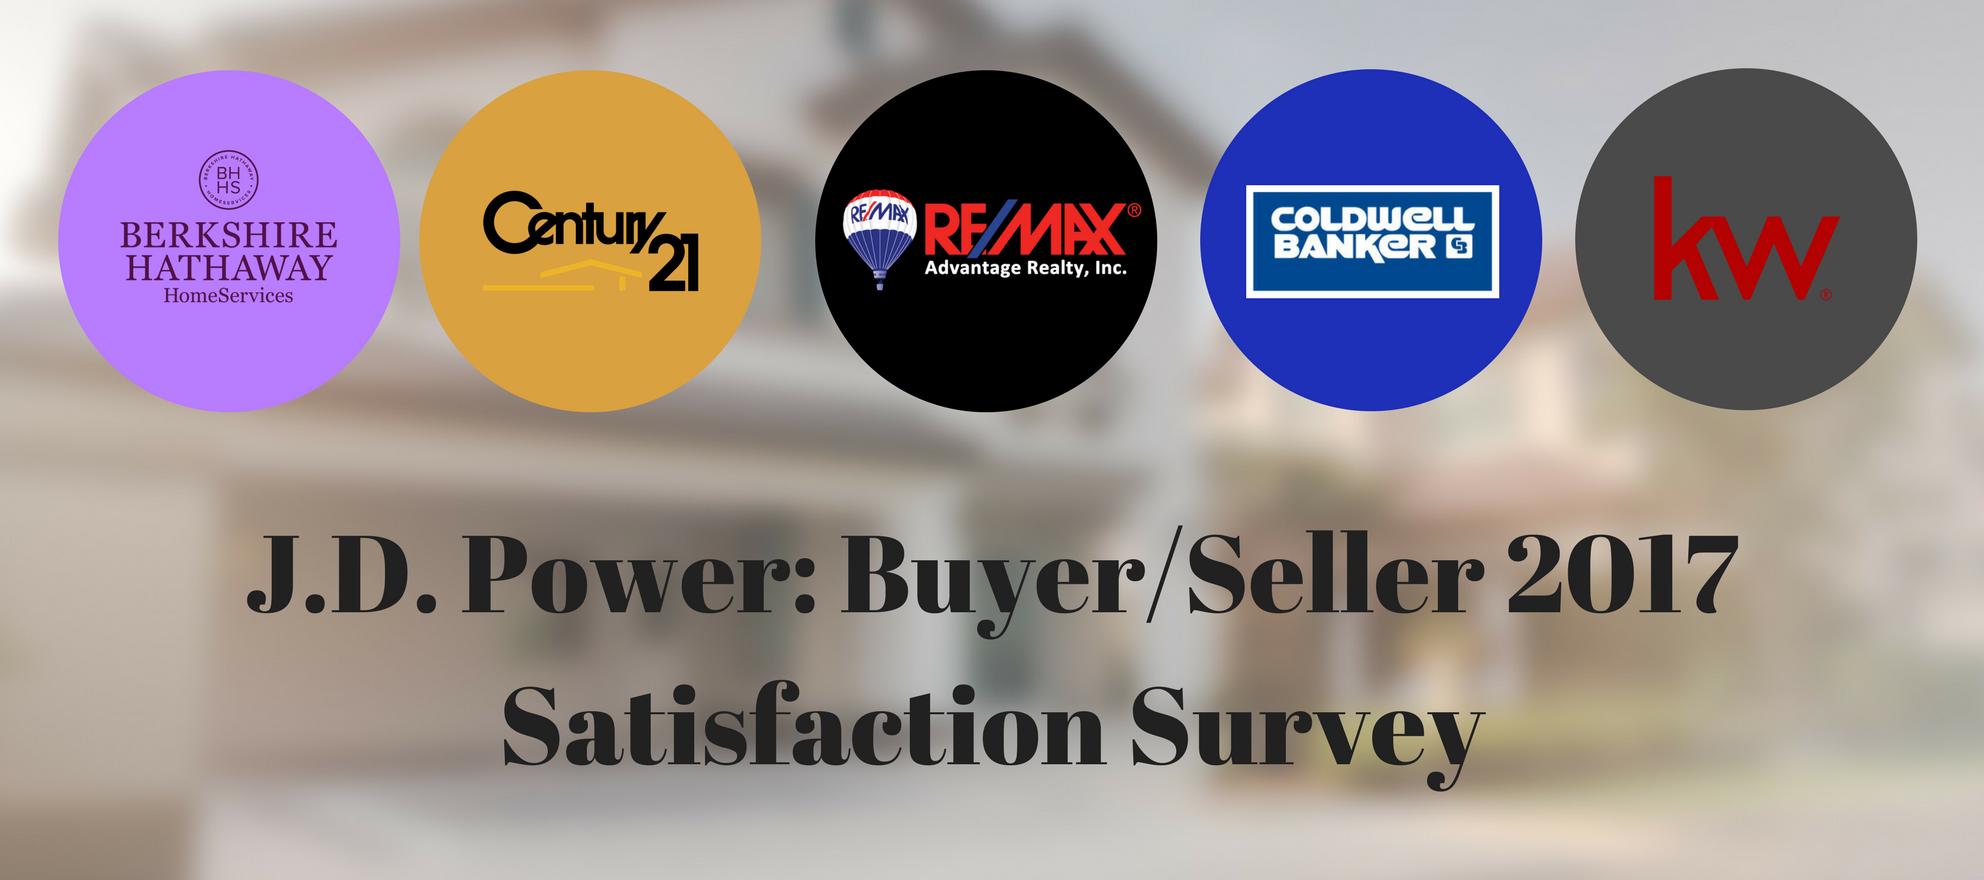 JD Power 2017 Homebuyer/Seller Satisfaction Study